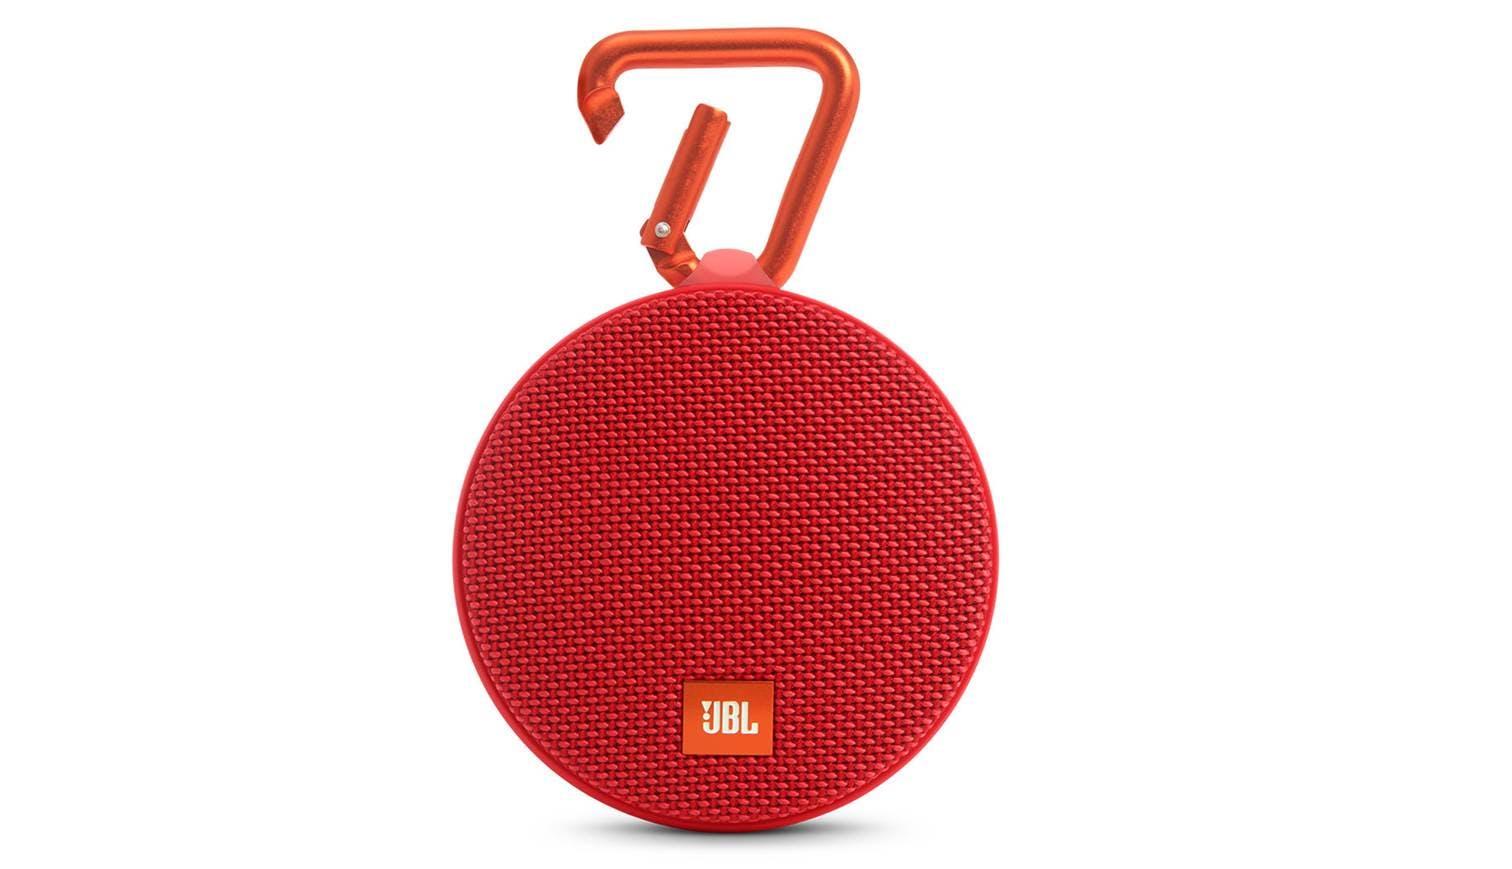 jbl clip ii portable bluetooth speaker red harvey norman singapore. Black Bedroom Furniture Sets. Home Design Ideas